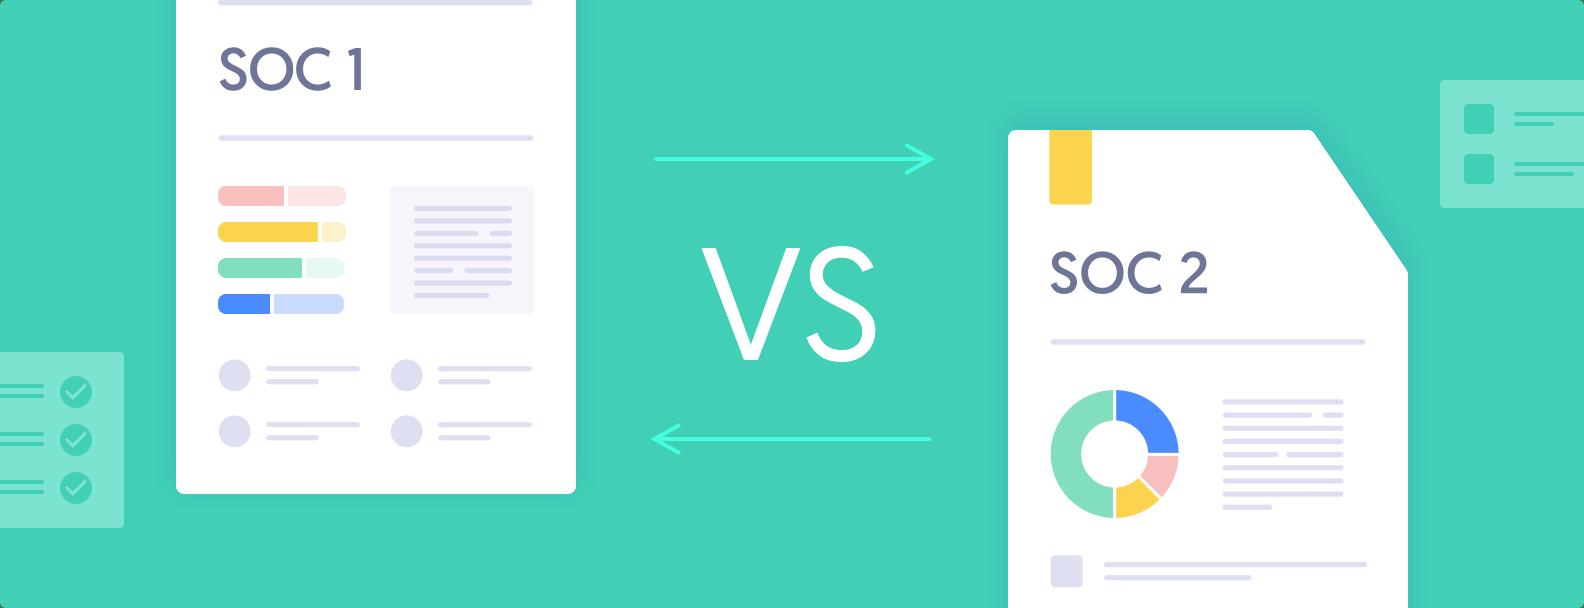 SOC 1 vs. SOC 2: A Simple Yet Complete Guide